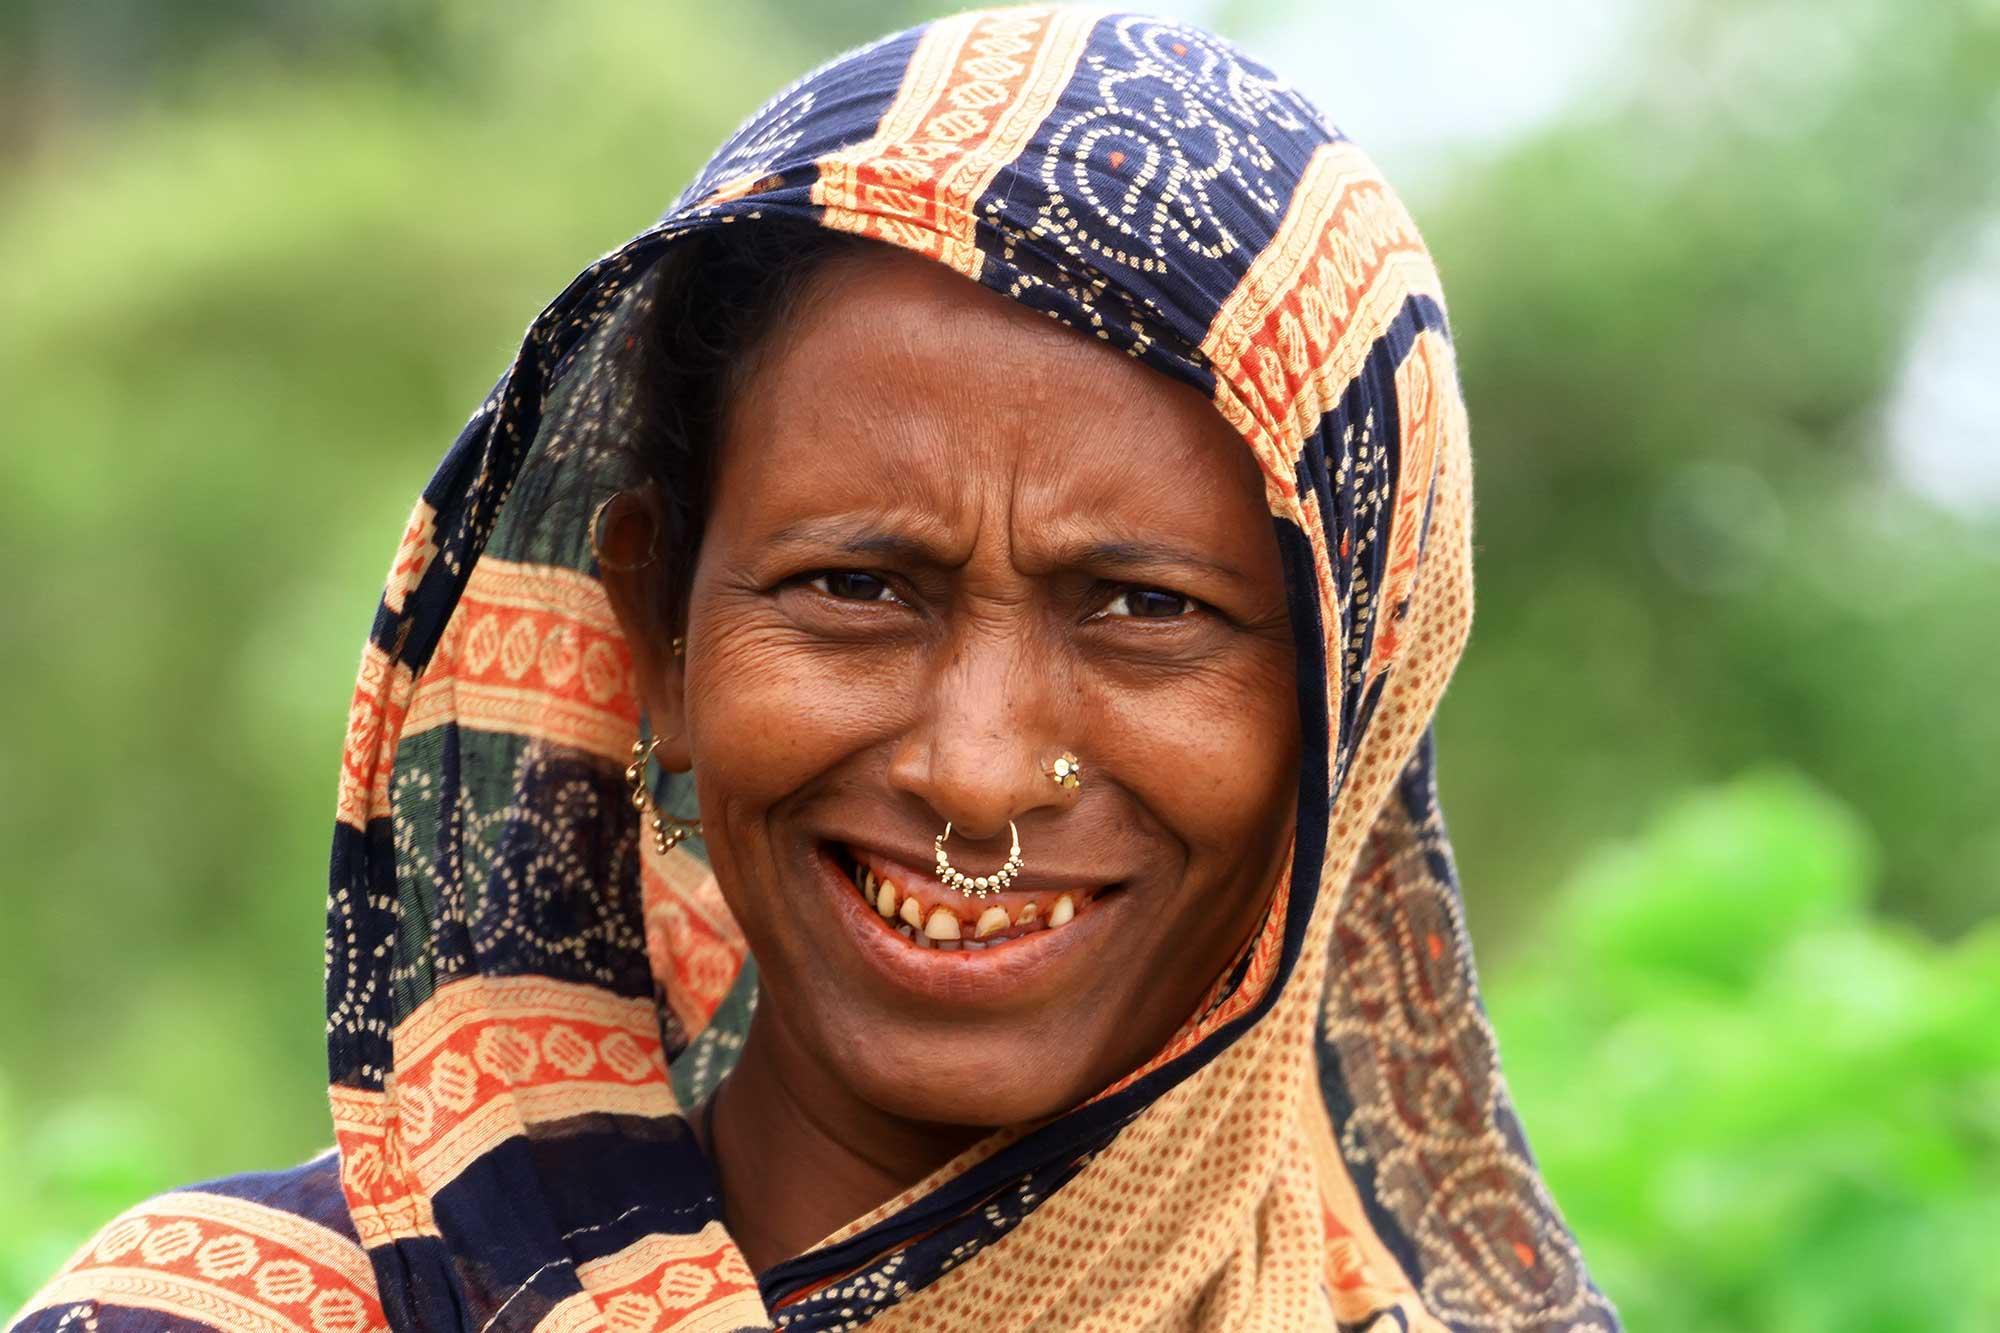 portrait-smiling-woman-kuakata-bangladesh